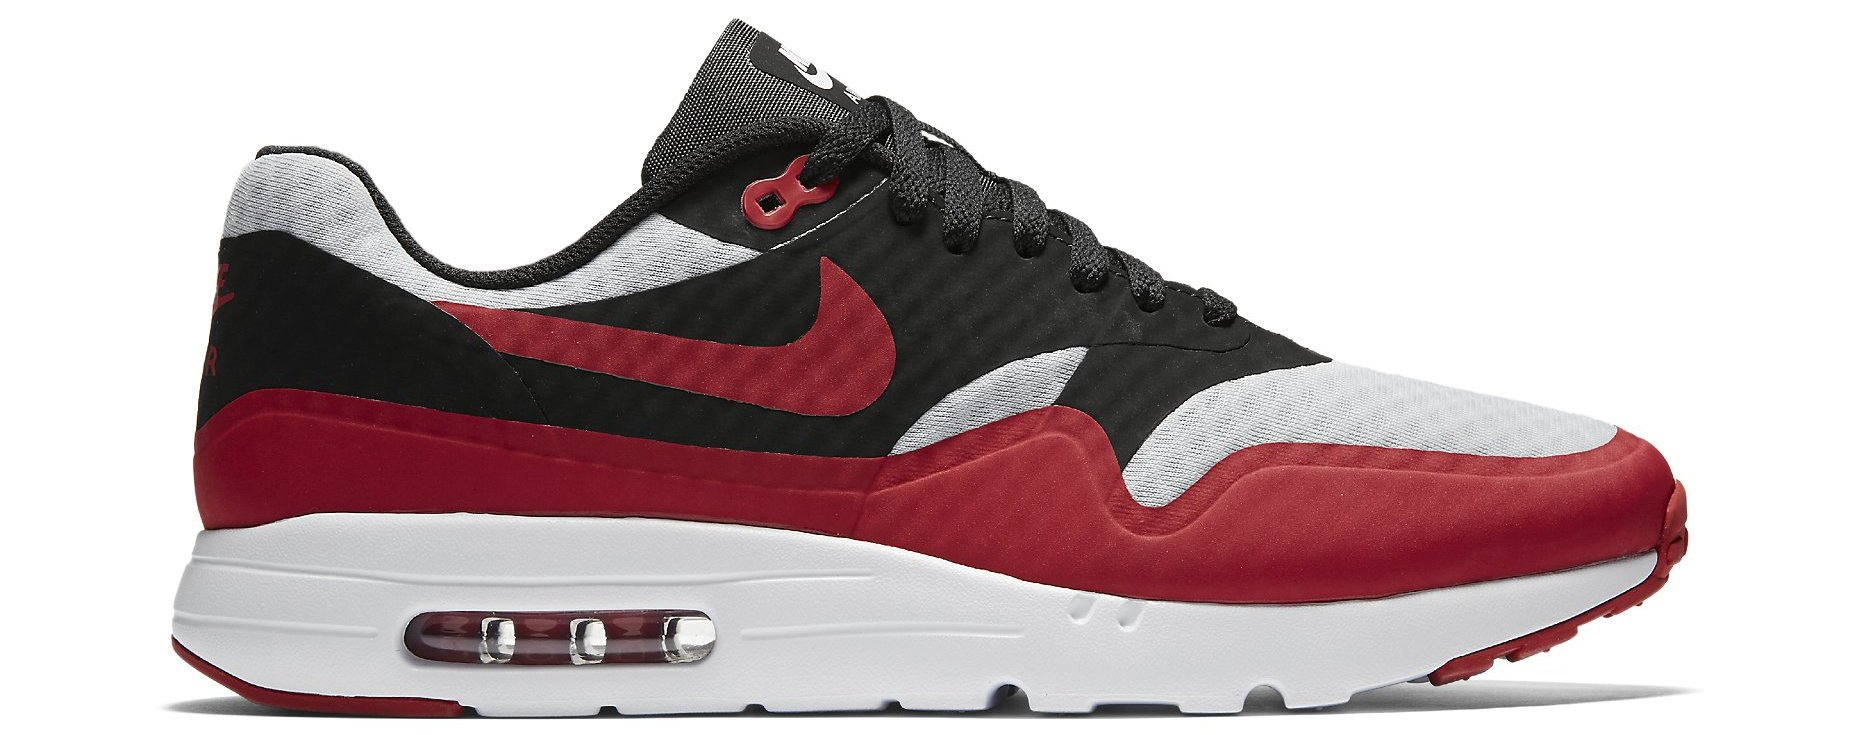 Obuv Nike Air Max 1 Ultra Essential